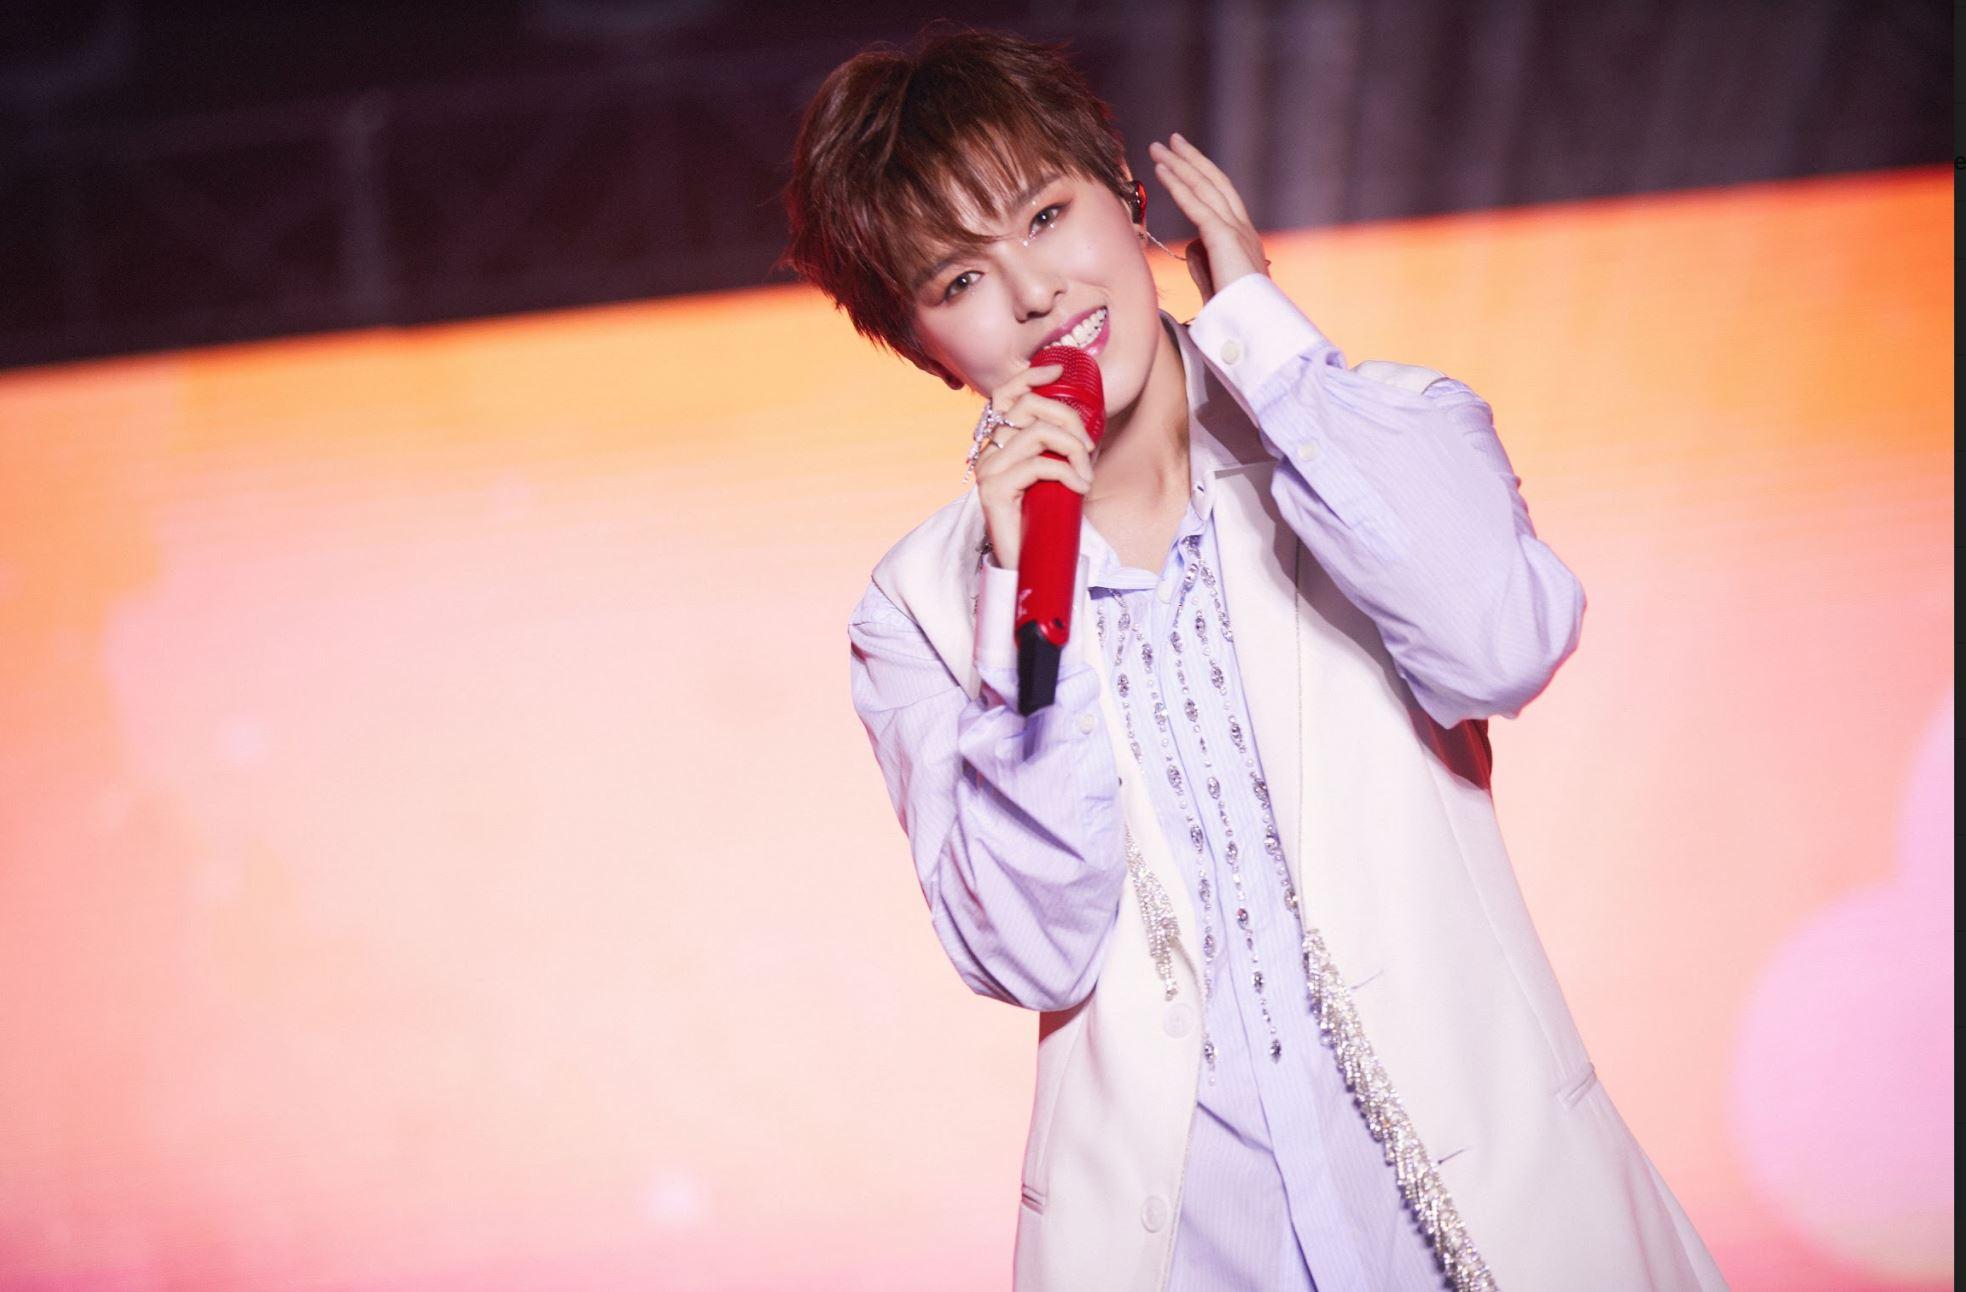 sunnee杨芸晴首张个人专辑《天气:晴》正式发行! 已破50万张!